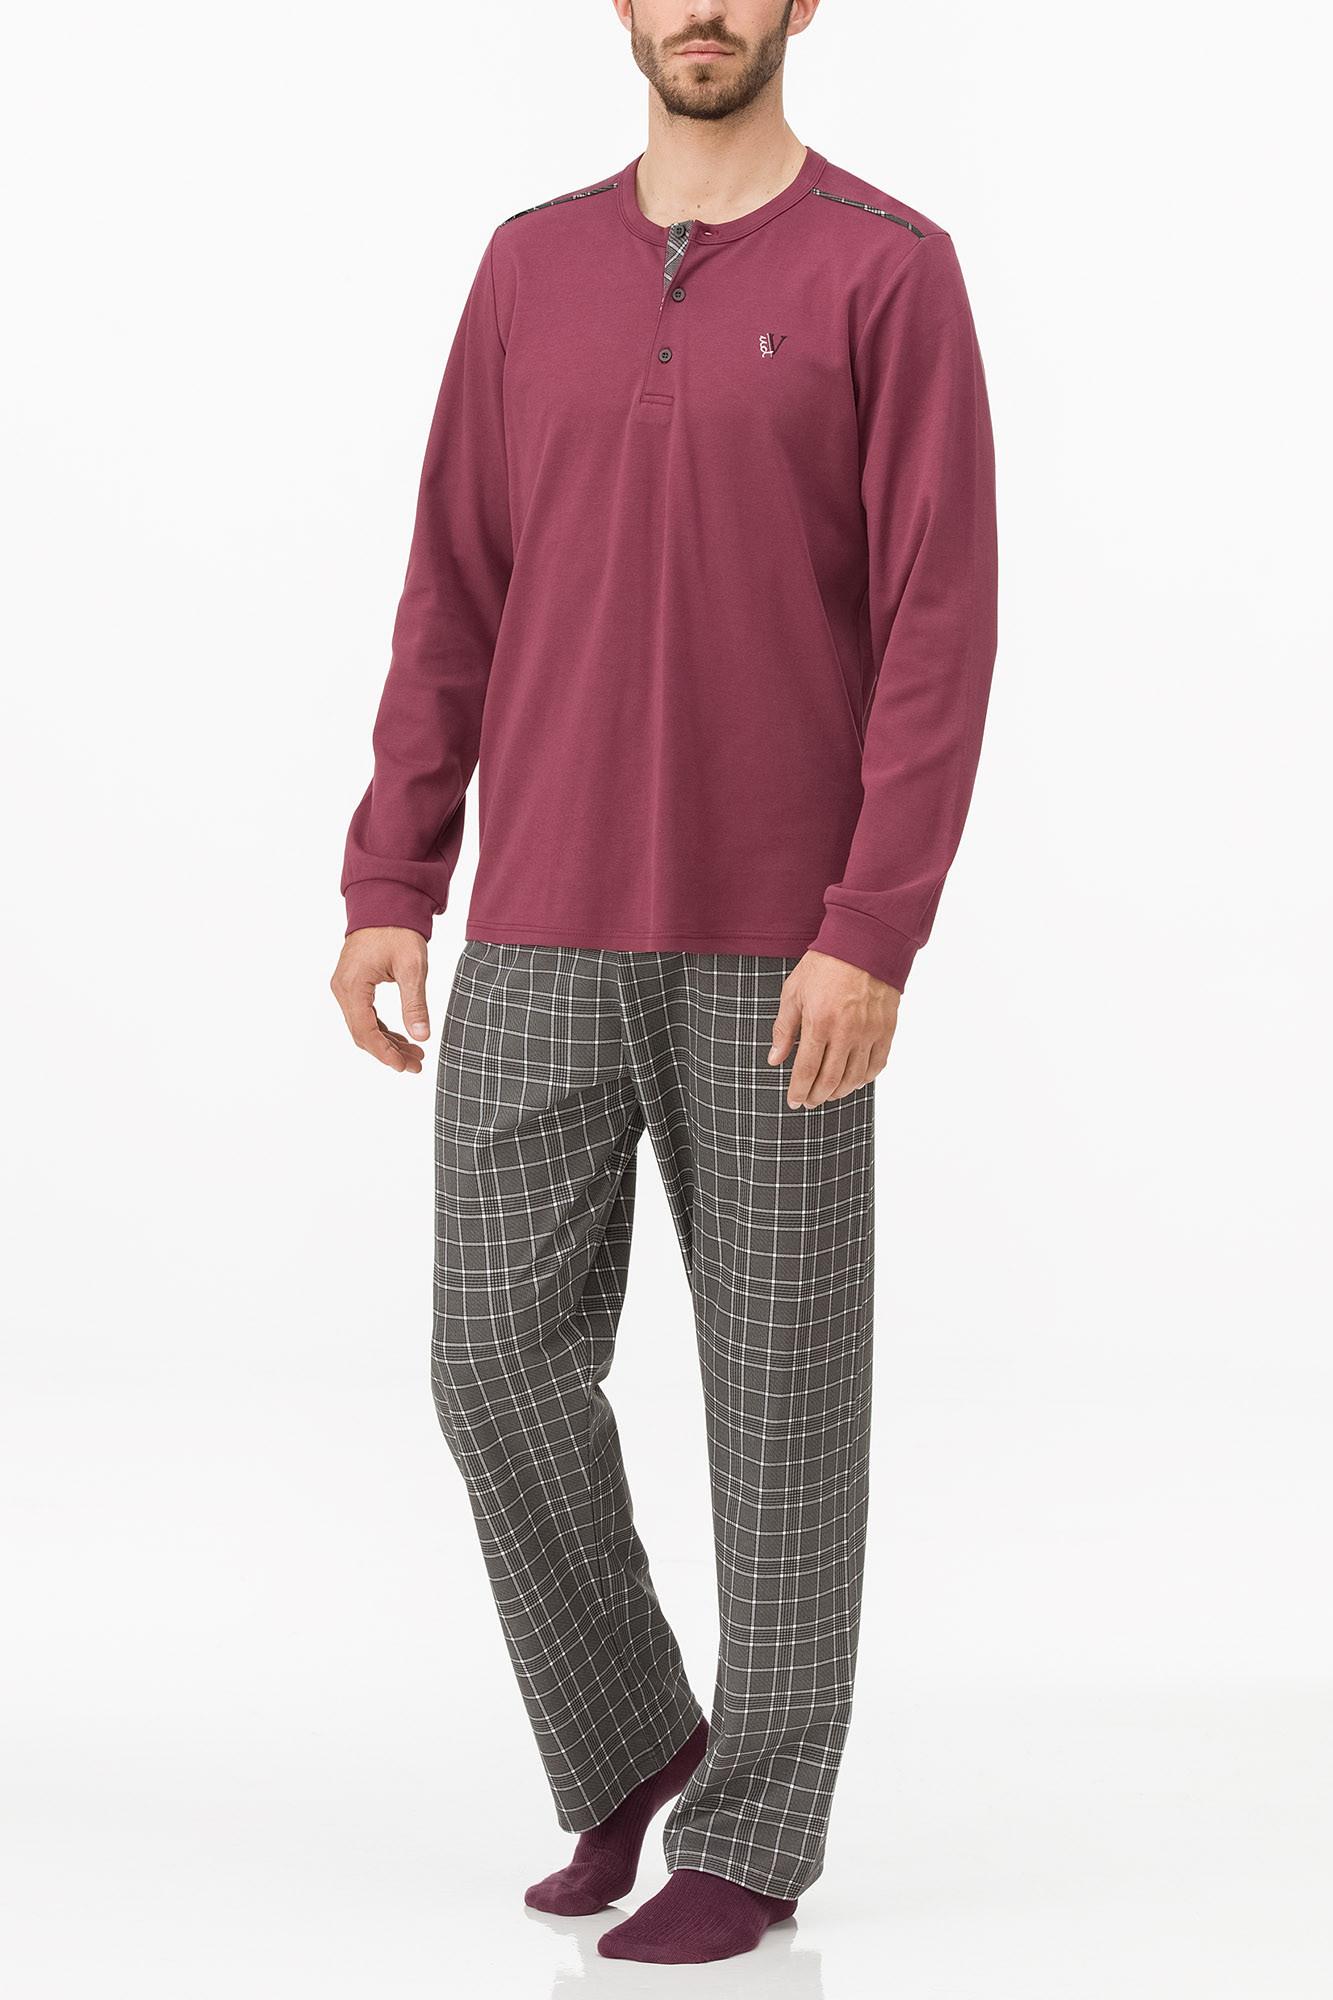 Vamp - Pohodlné pánske pyžamo 11683 - Vamp bordeaux imperial 4XL